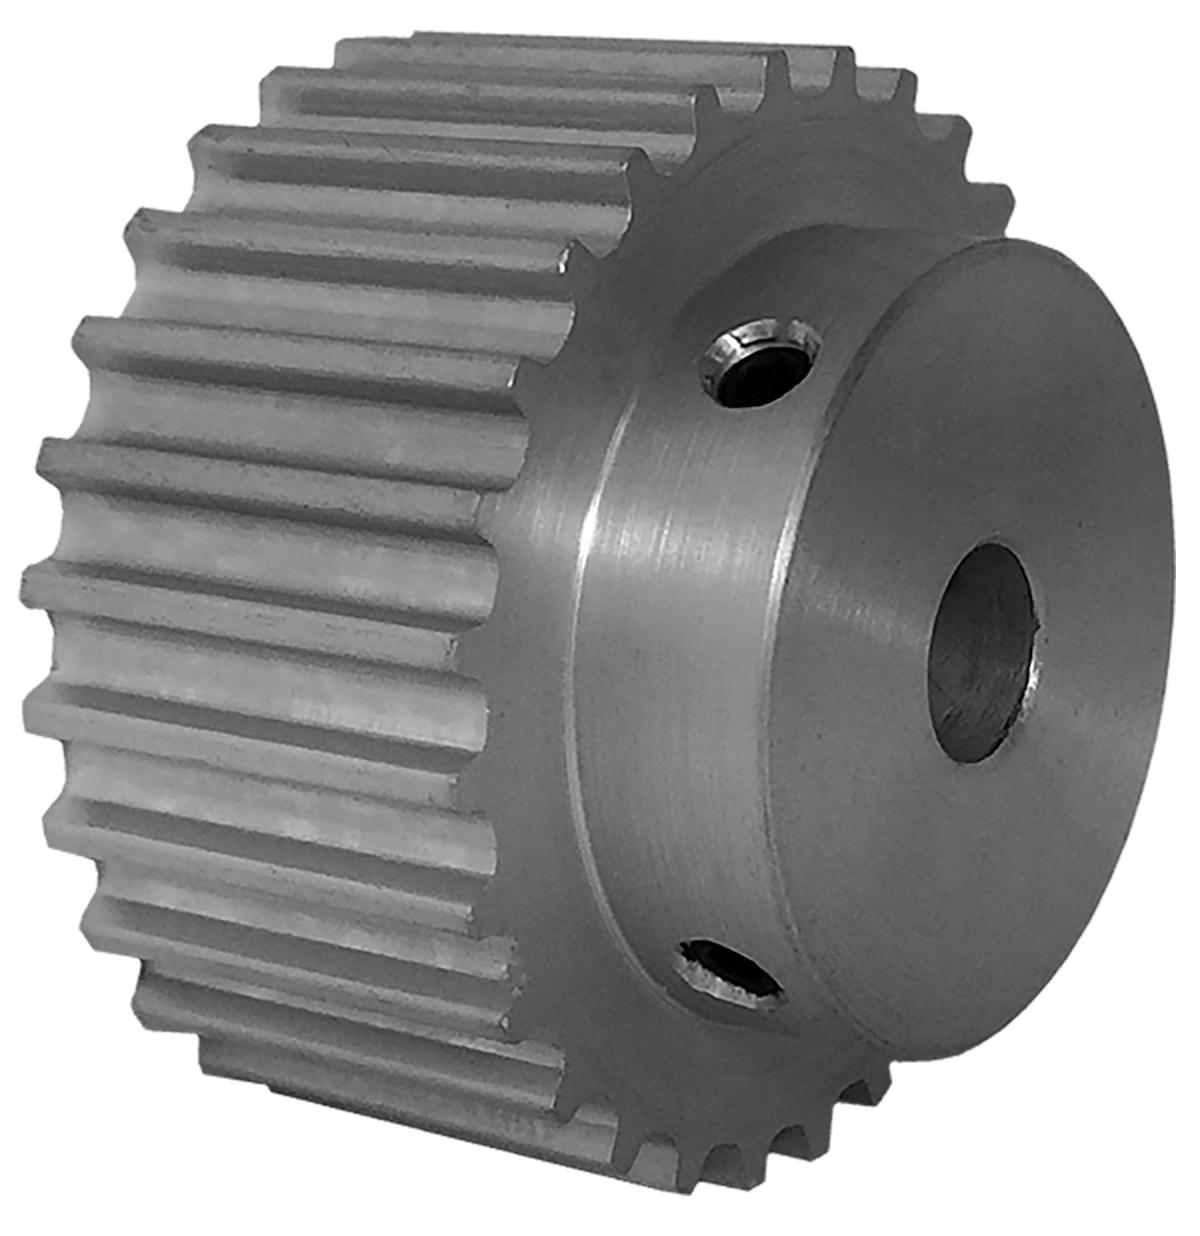 28-5M15M6A8 - Aluminum Powerhouse®HTD® Pulleys